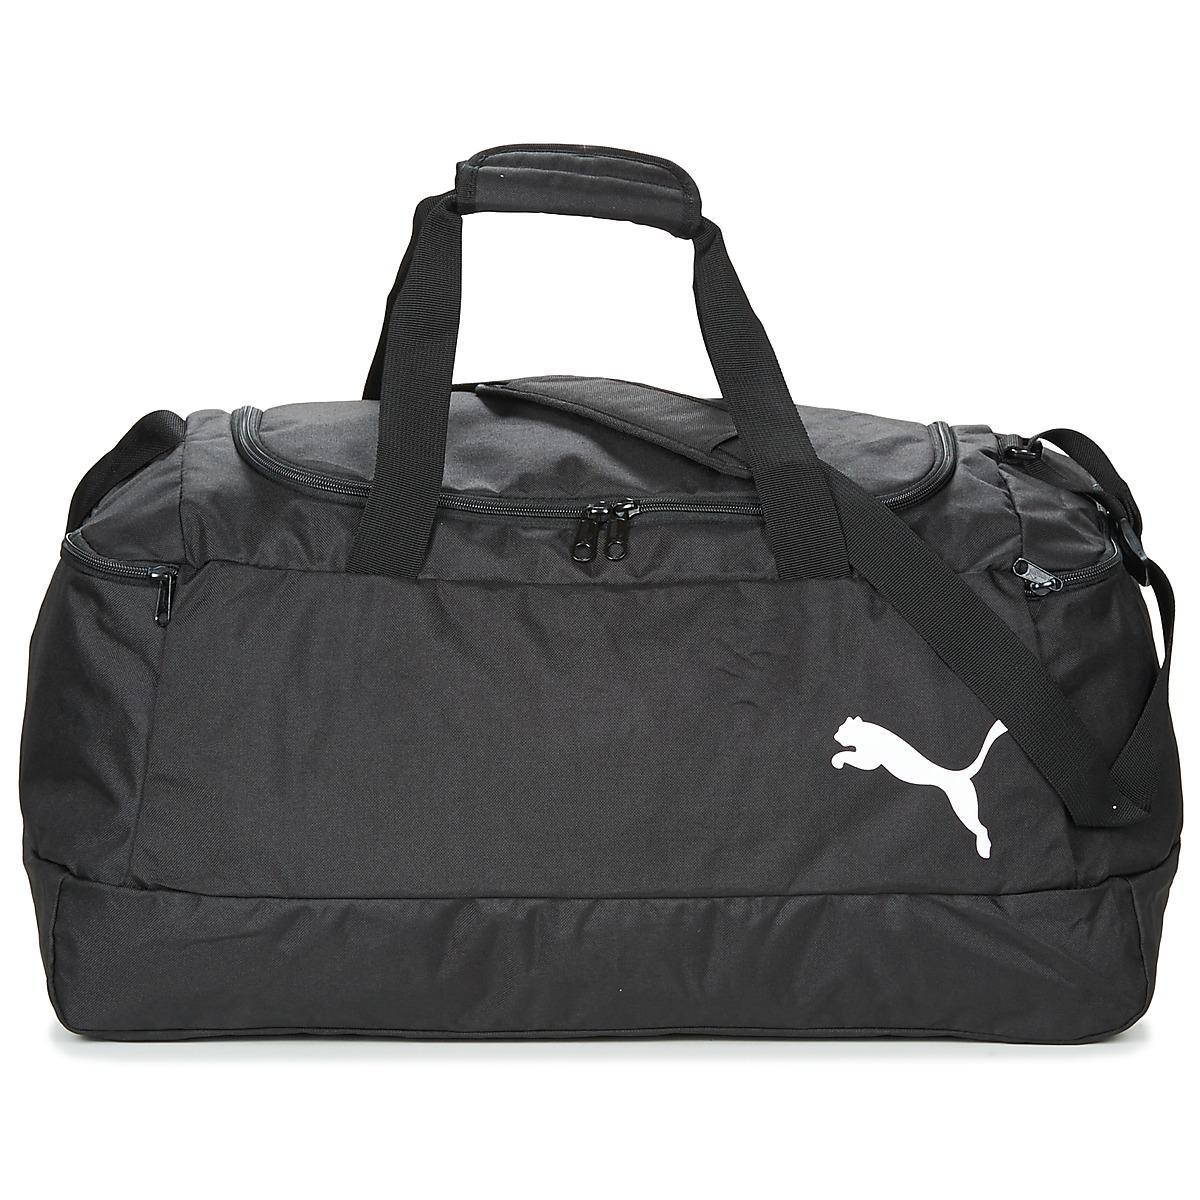 PUMA Pro Training Ii Medium Bag Sports Bag in Black for Men - Lyst 4cbaf167cd9bb